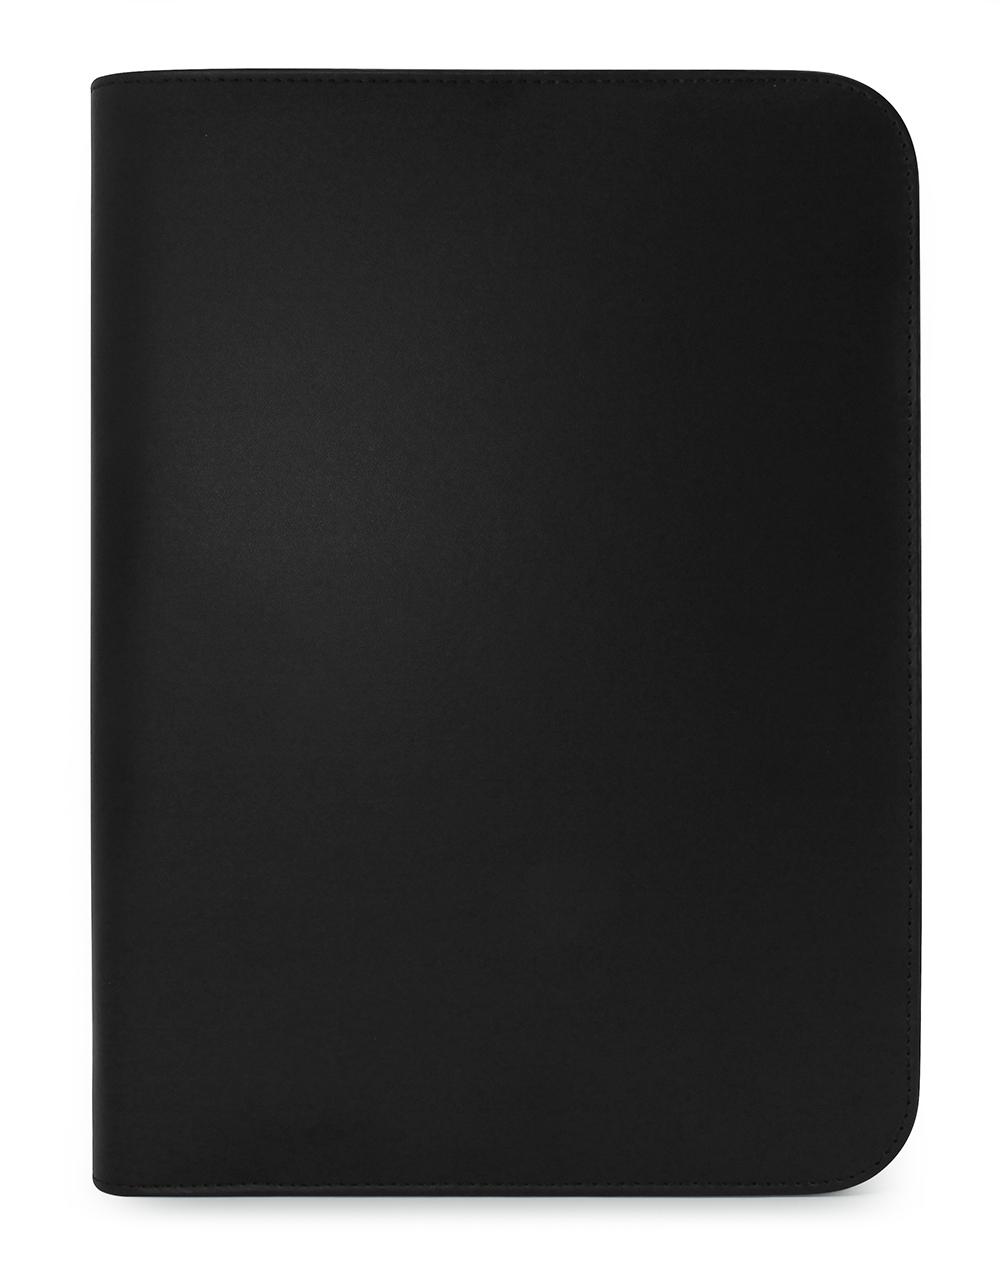 Clapham PU A4 Zipped Conference Folder with logo